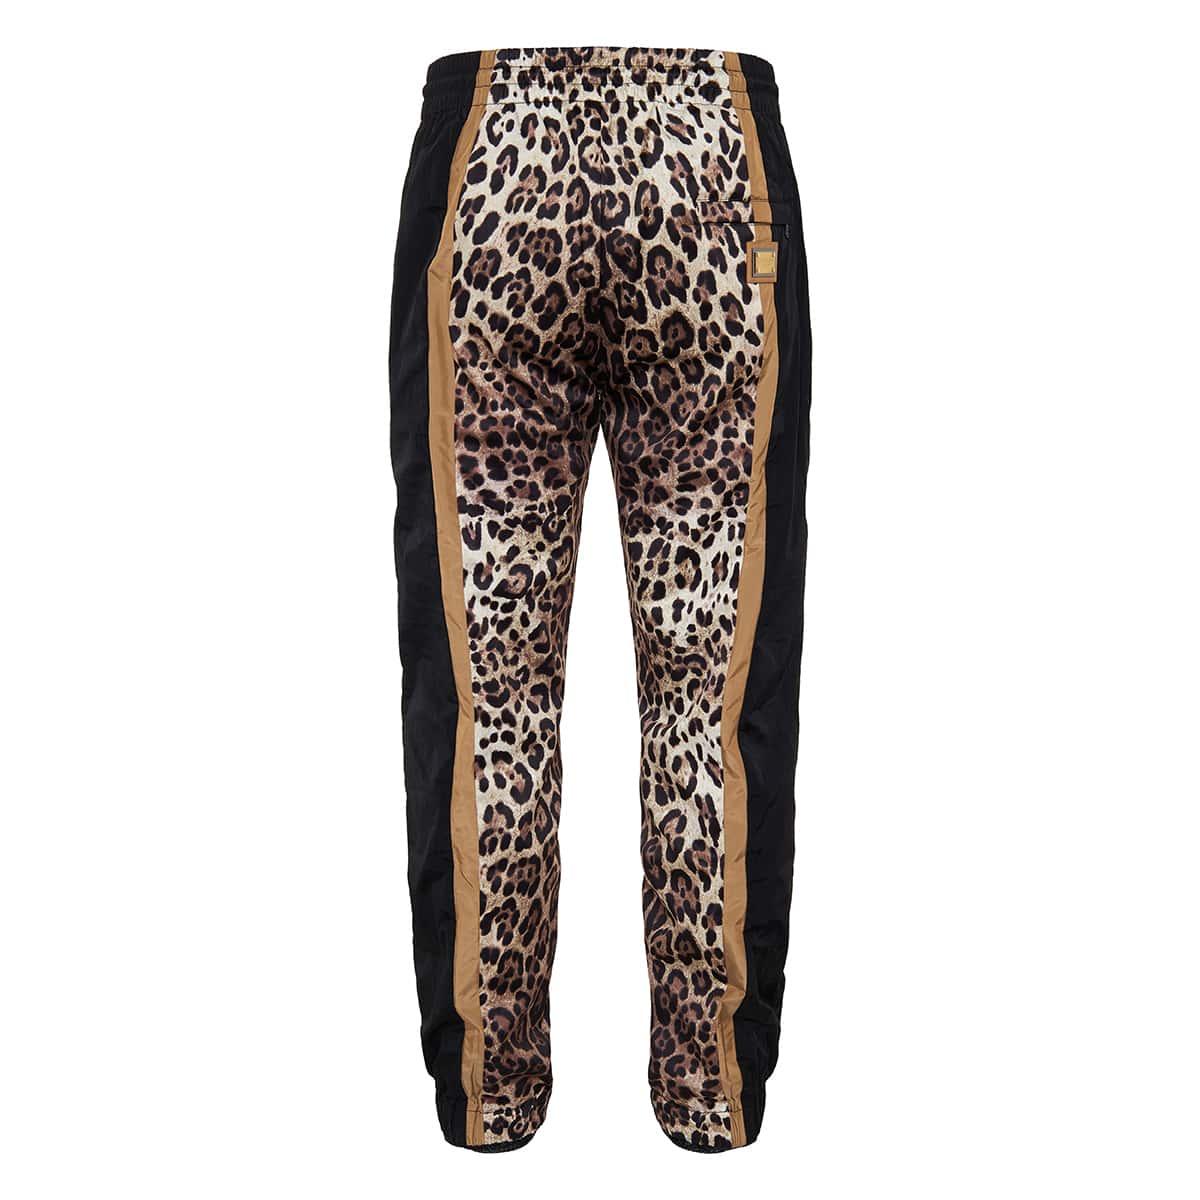 Leopard print jogging trousers